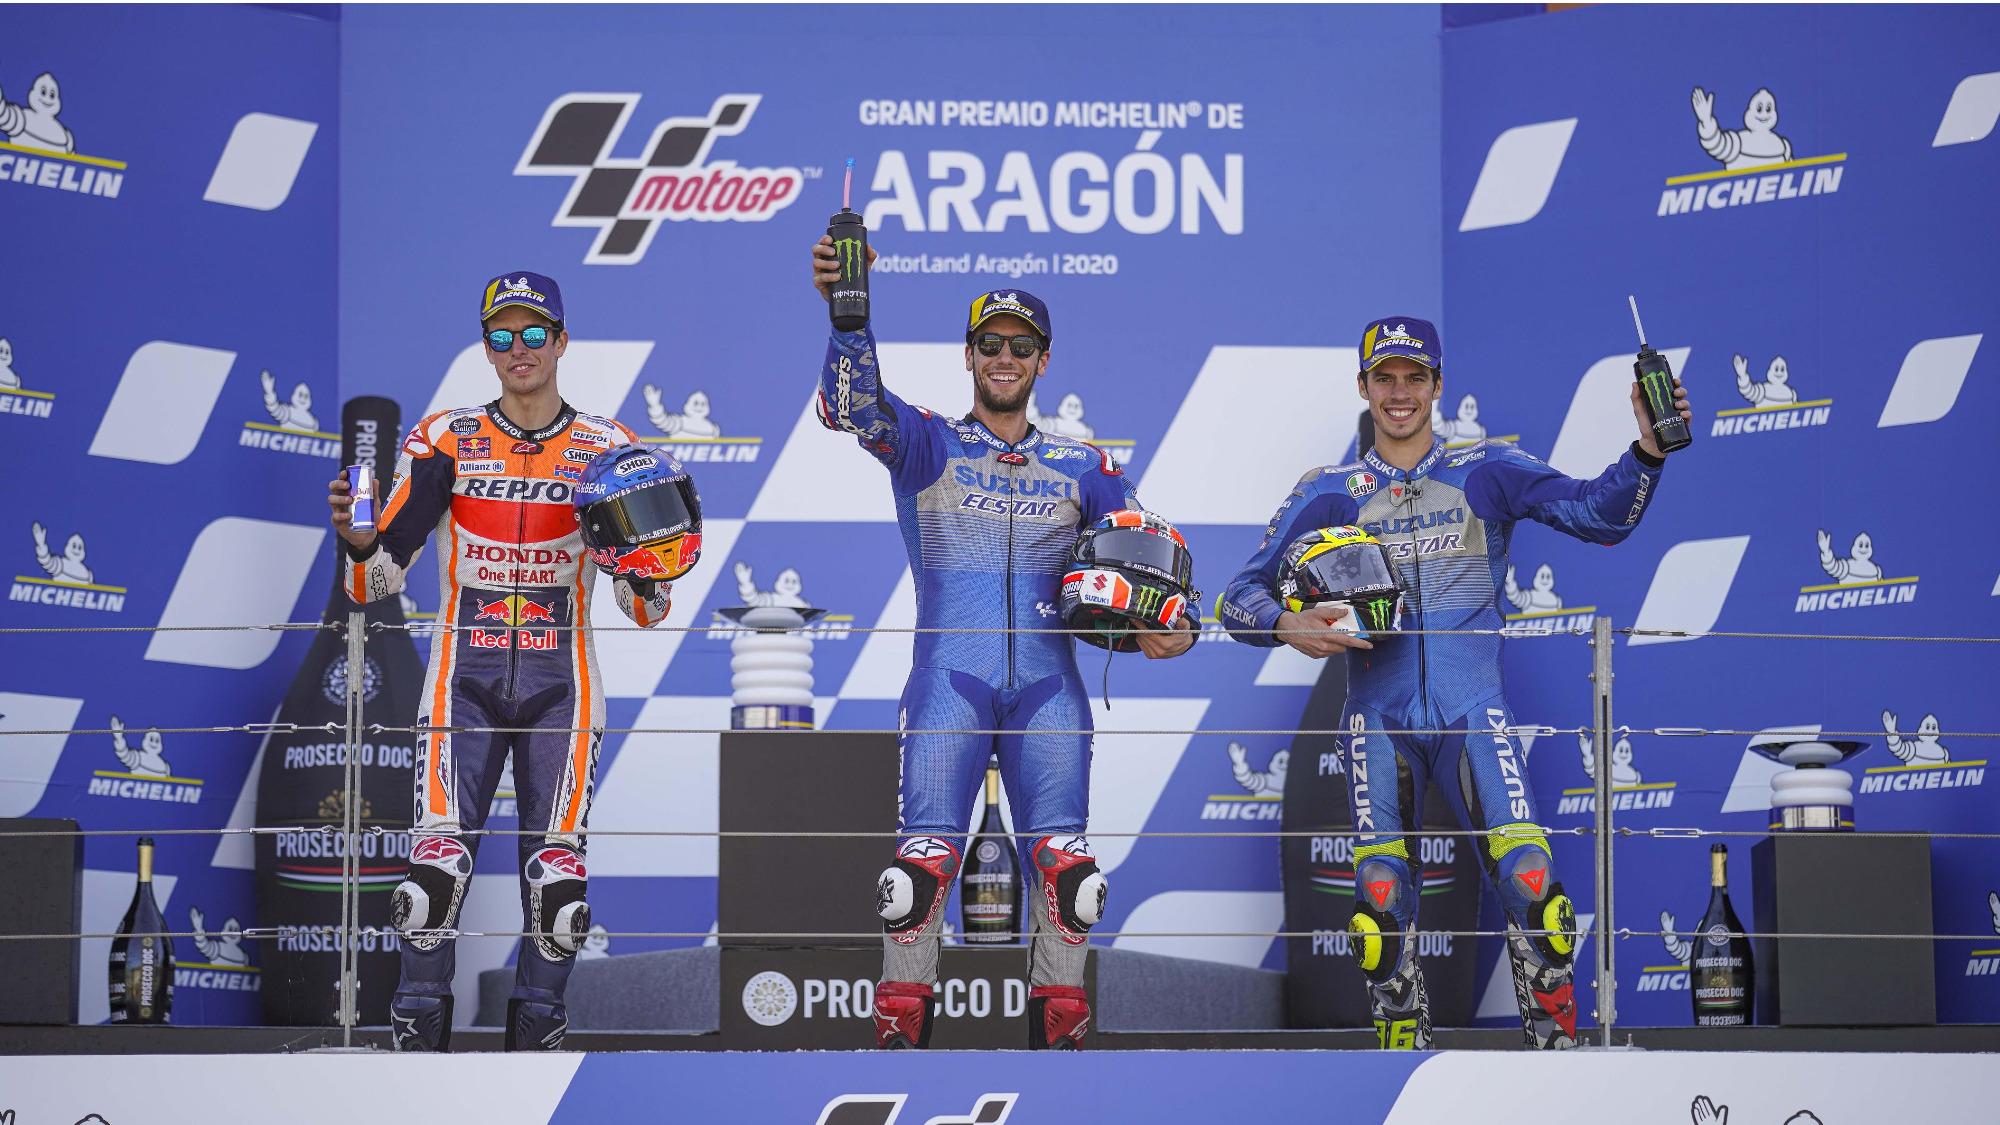 2020 Aragon GP MotoGP Podium